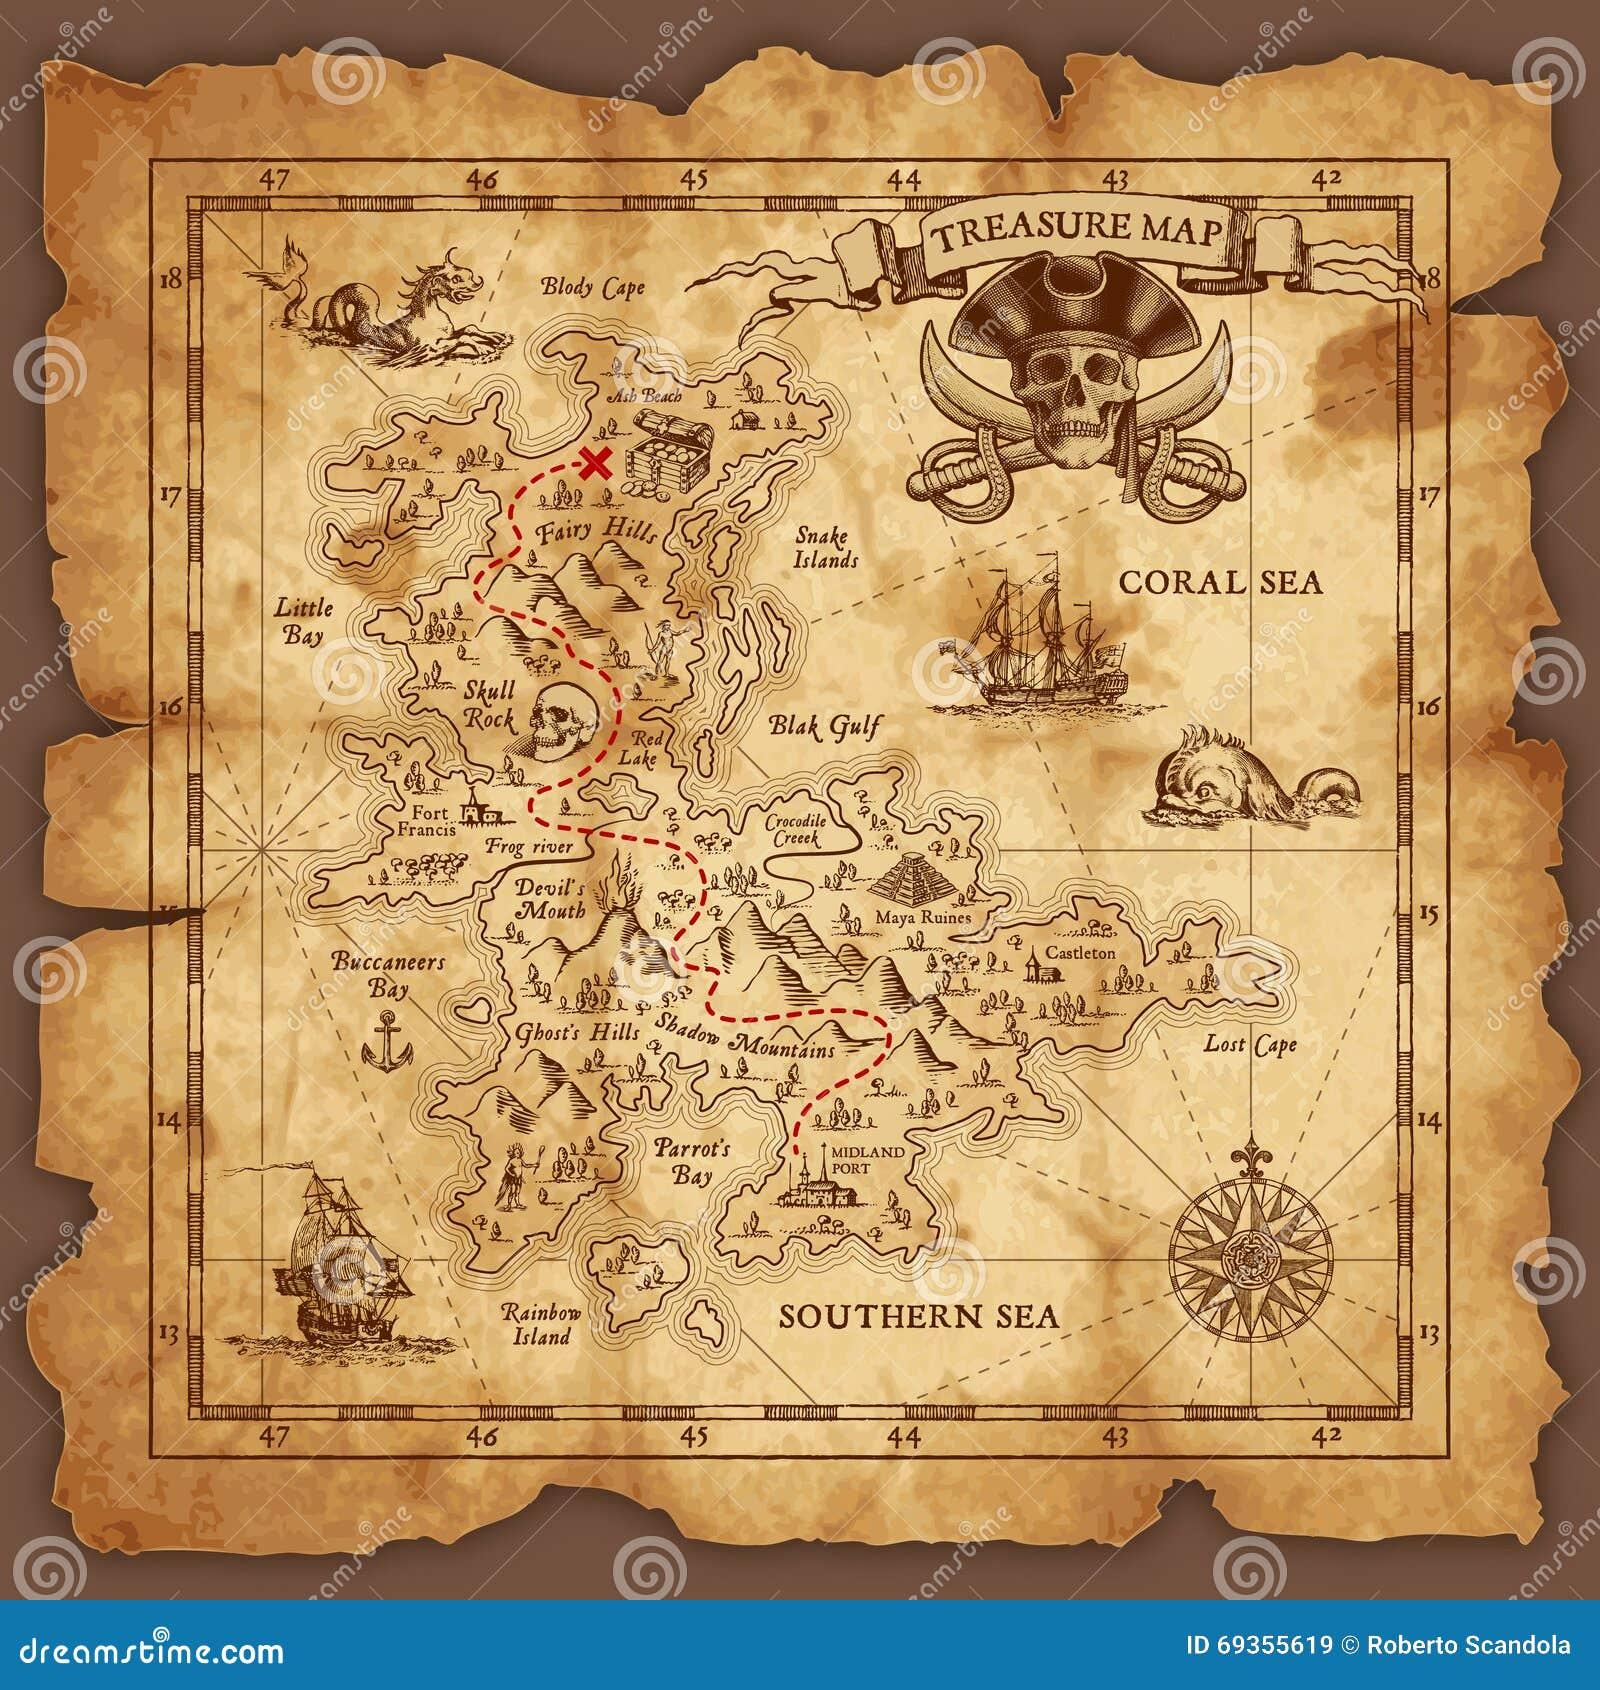 Mapa do tesouro do pirata do vetor